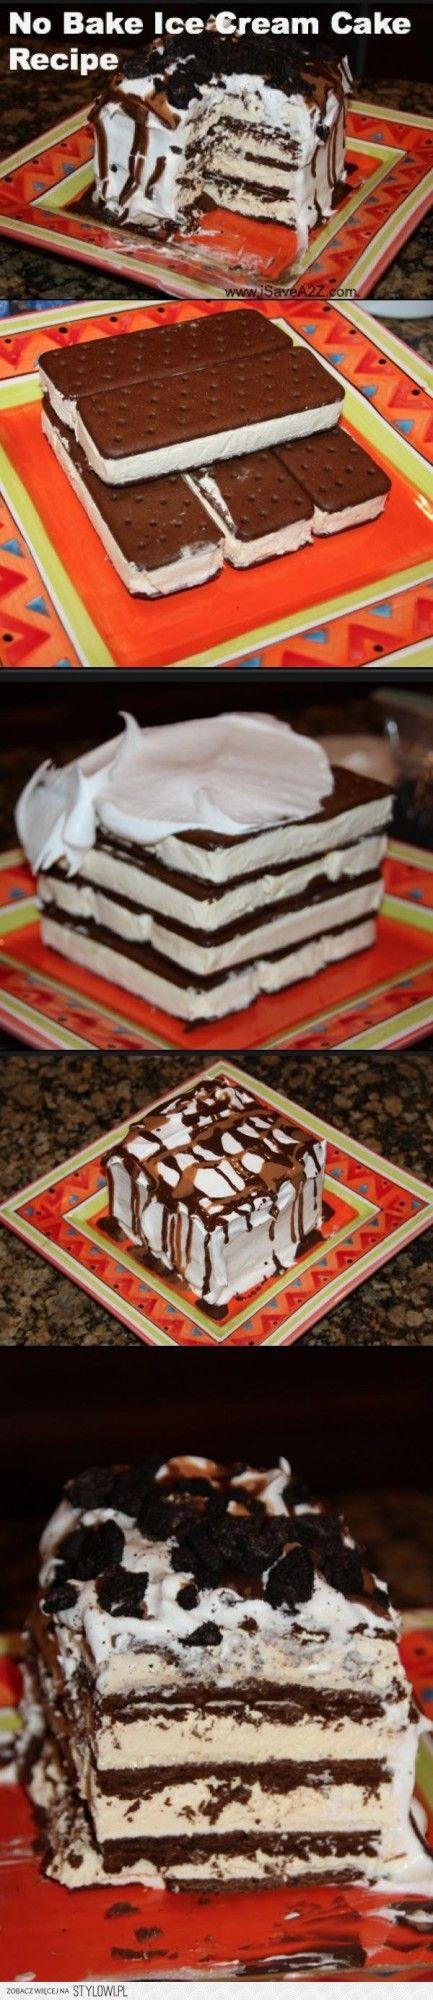 18 Simple and Quick Dessert Recipes - Ice Cream Sandwich Cake